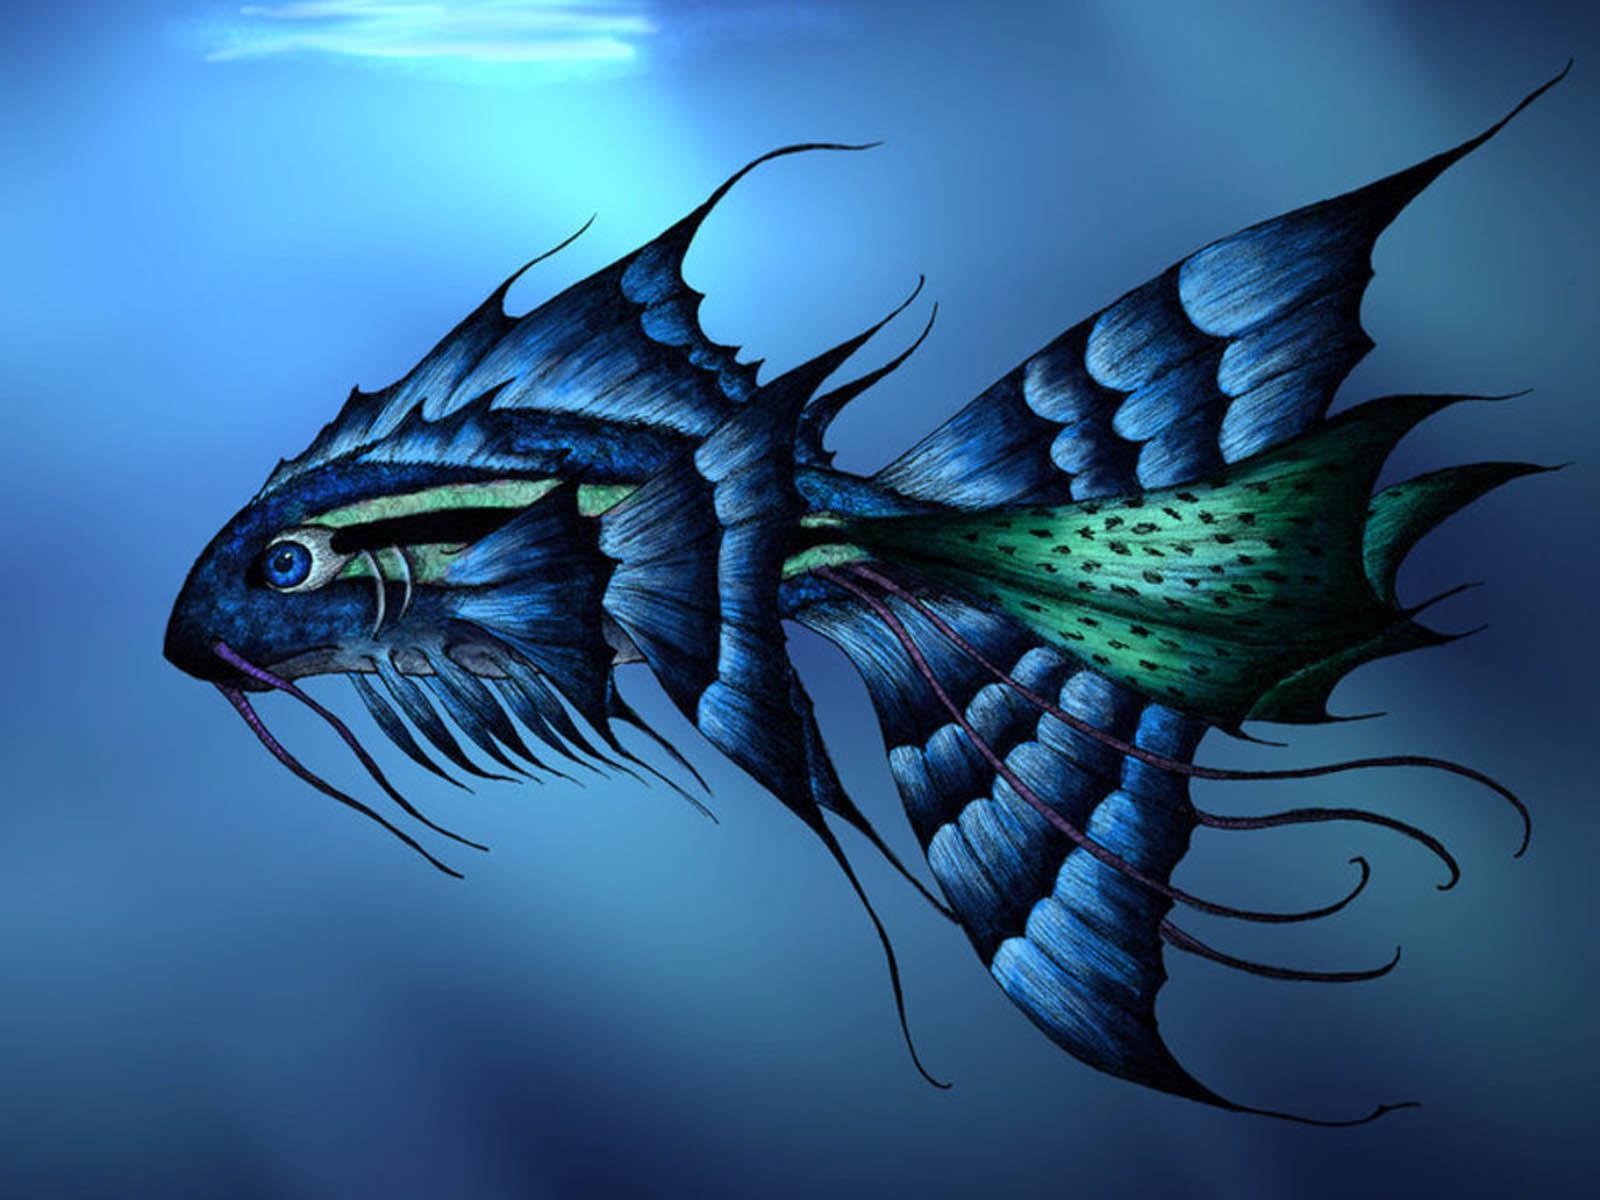 Wallpapers 3D Fish Desktop Wallpapers 3D Fish Desktop Backgrounds 1600x1200